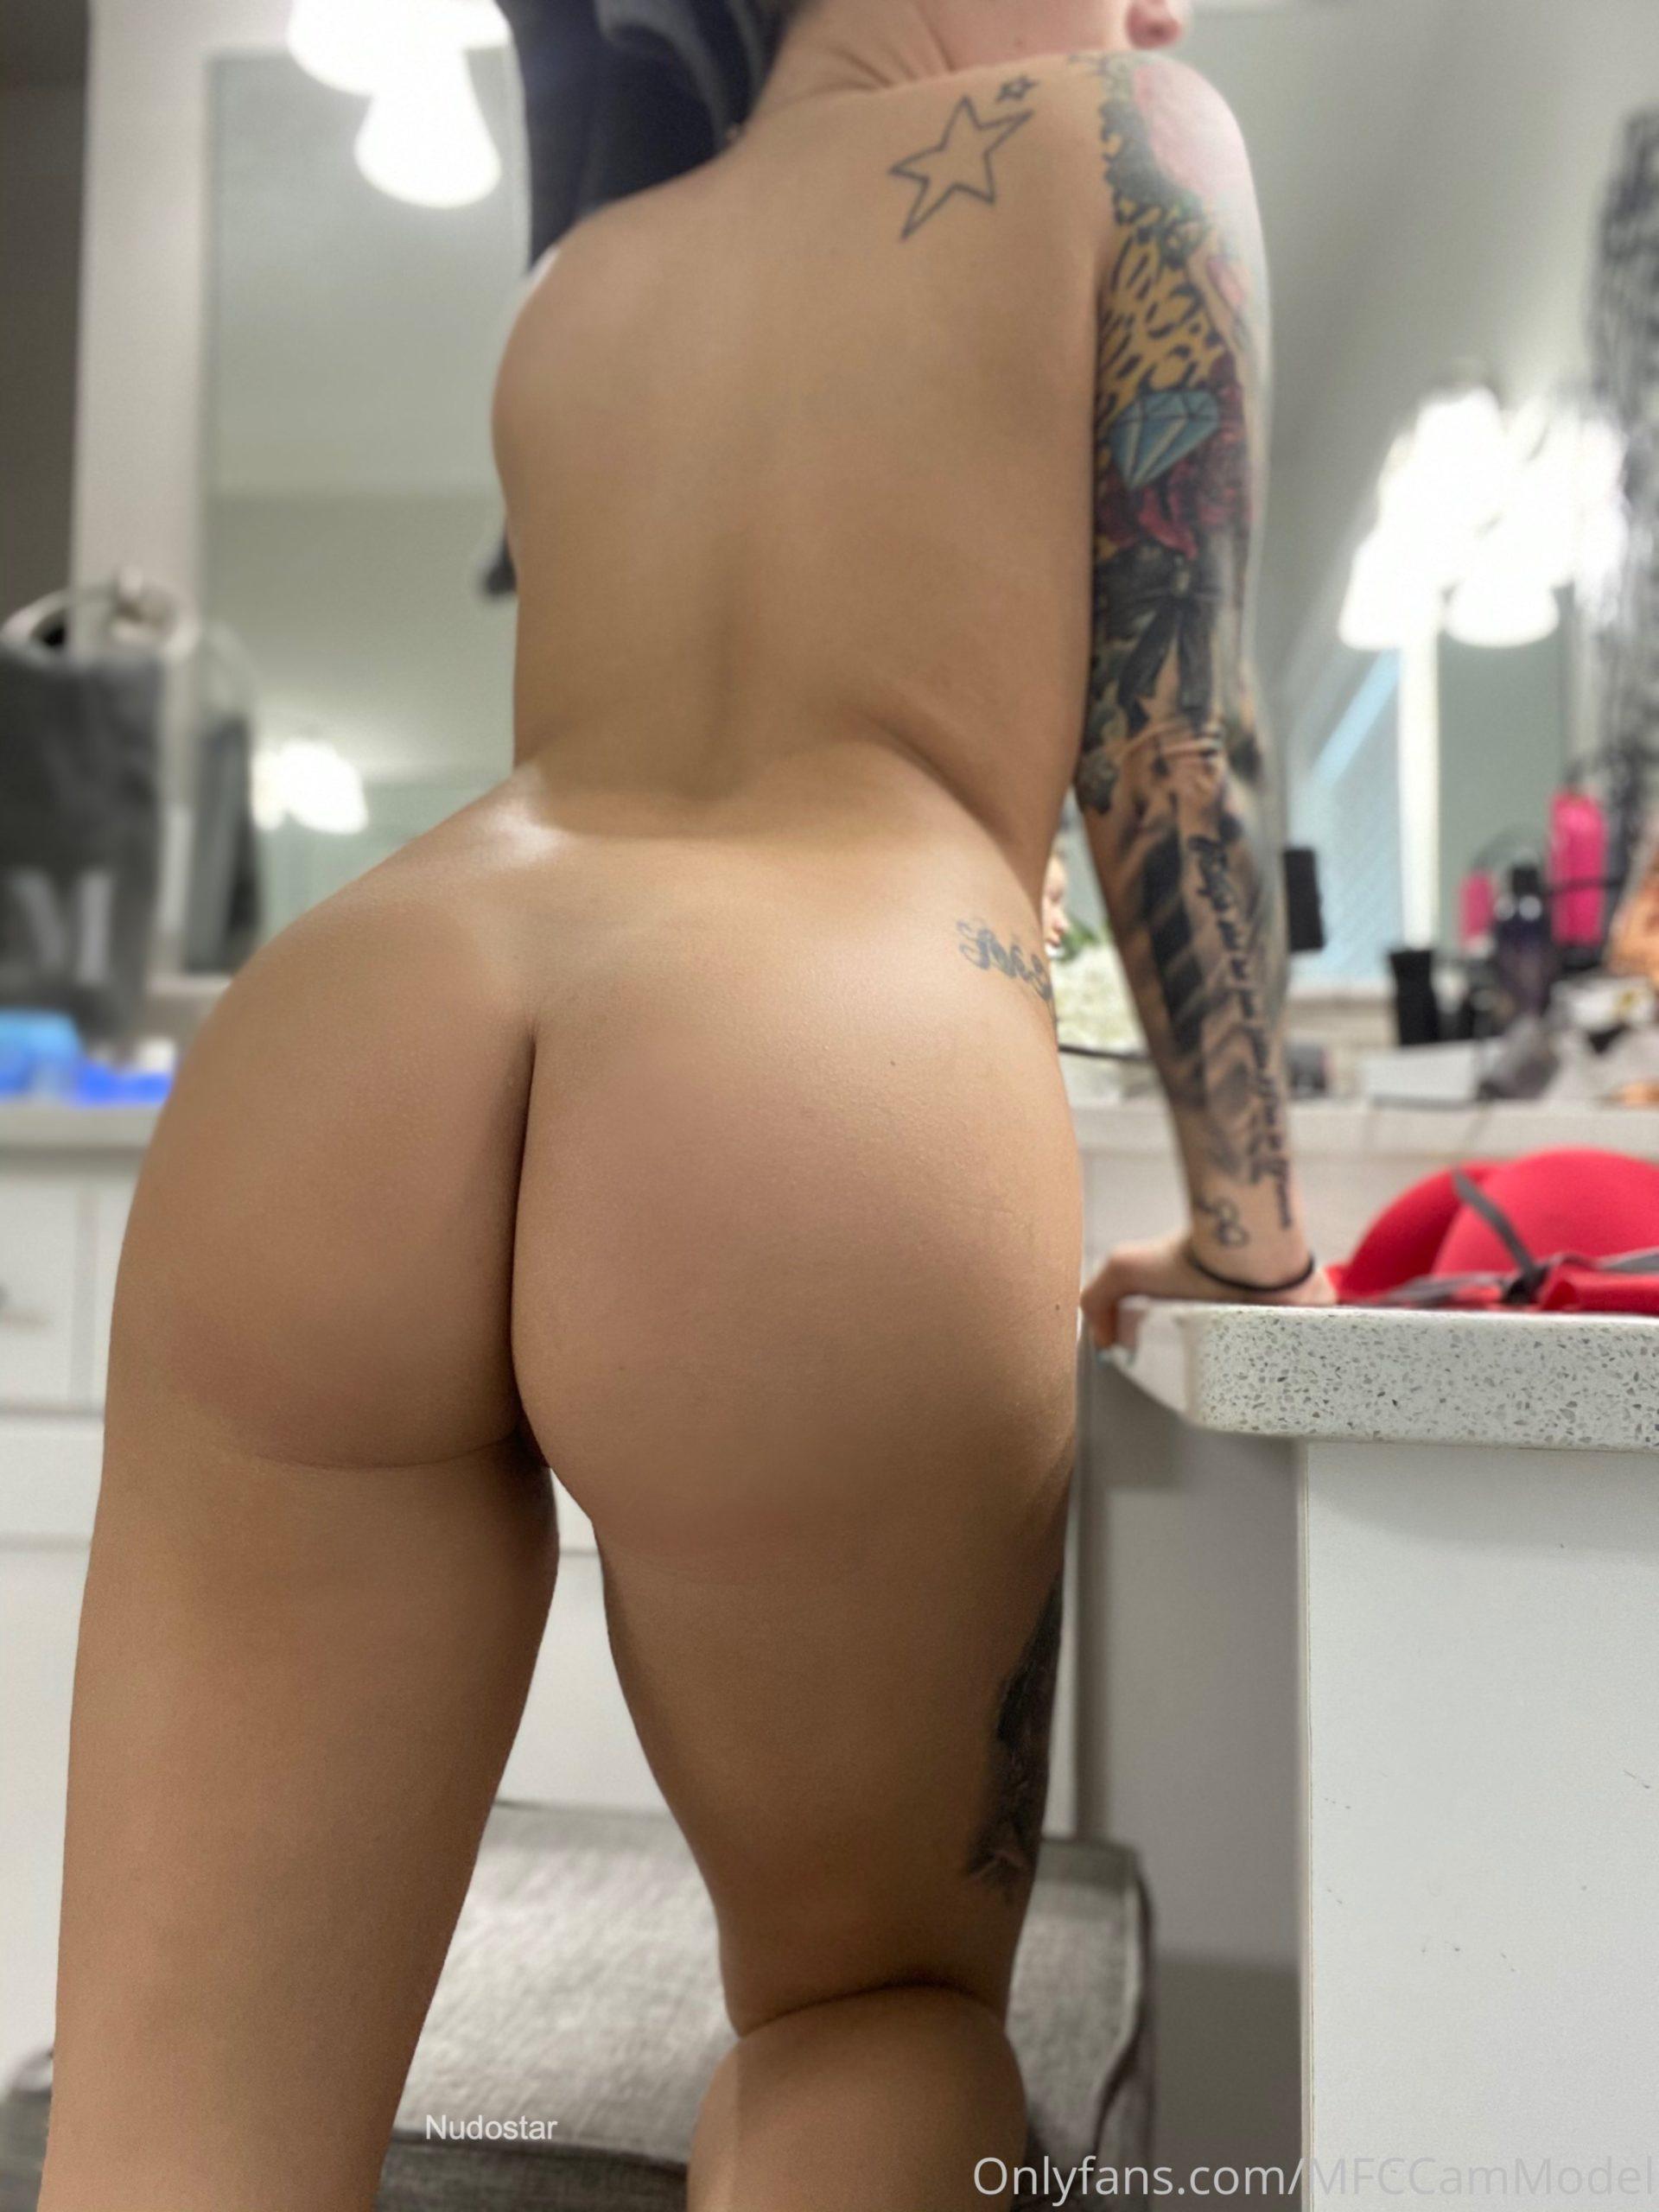 Cheekschase Mfccammodel Onlyfans Nudes Leaks 0004